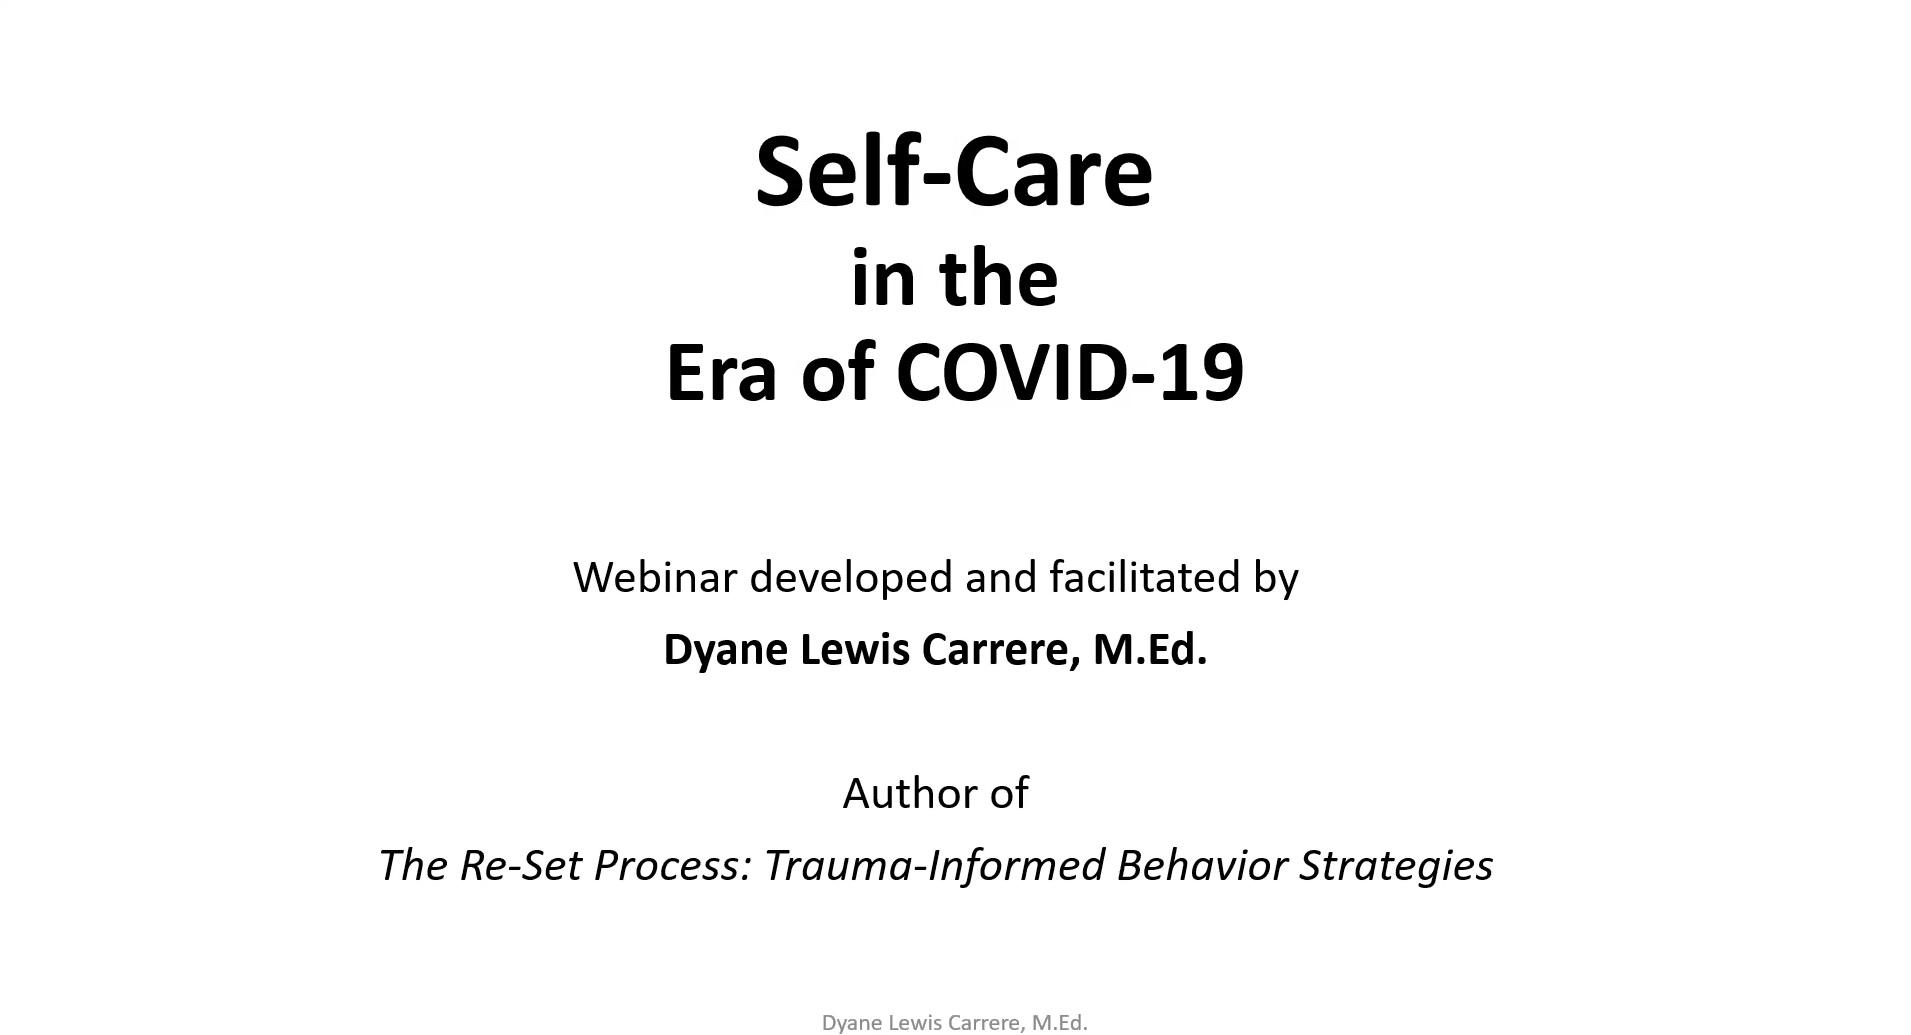 Self-Care in the Era of COVID-19 webinar